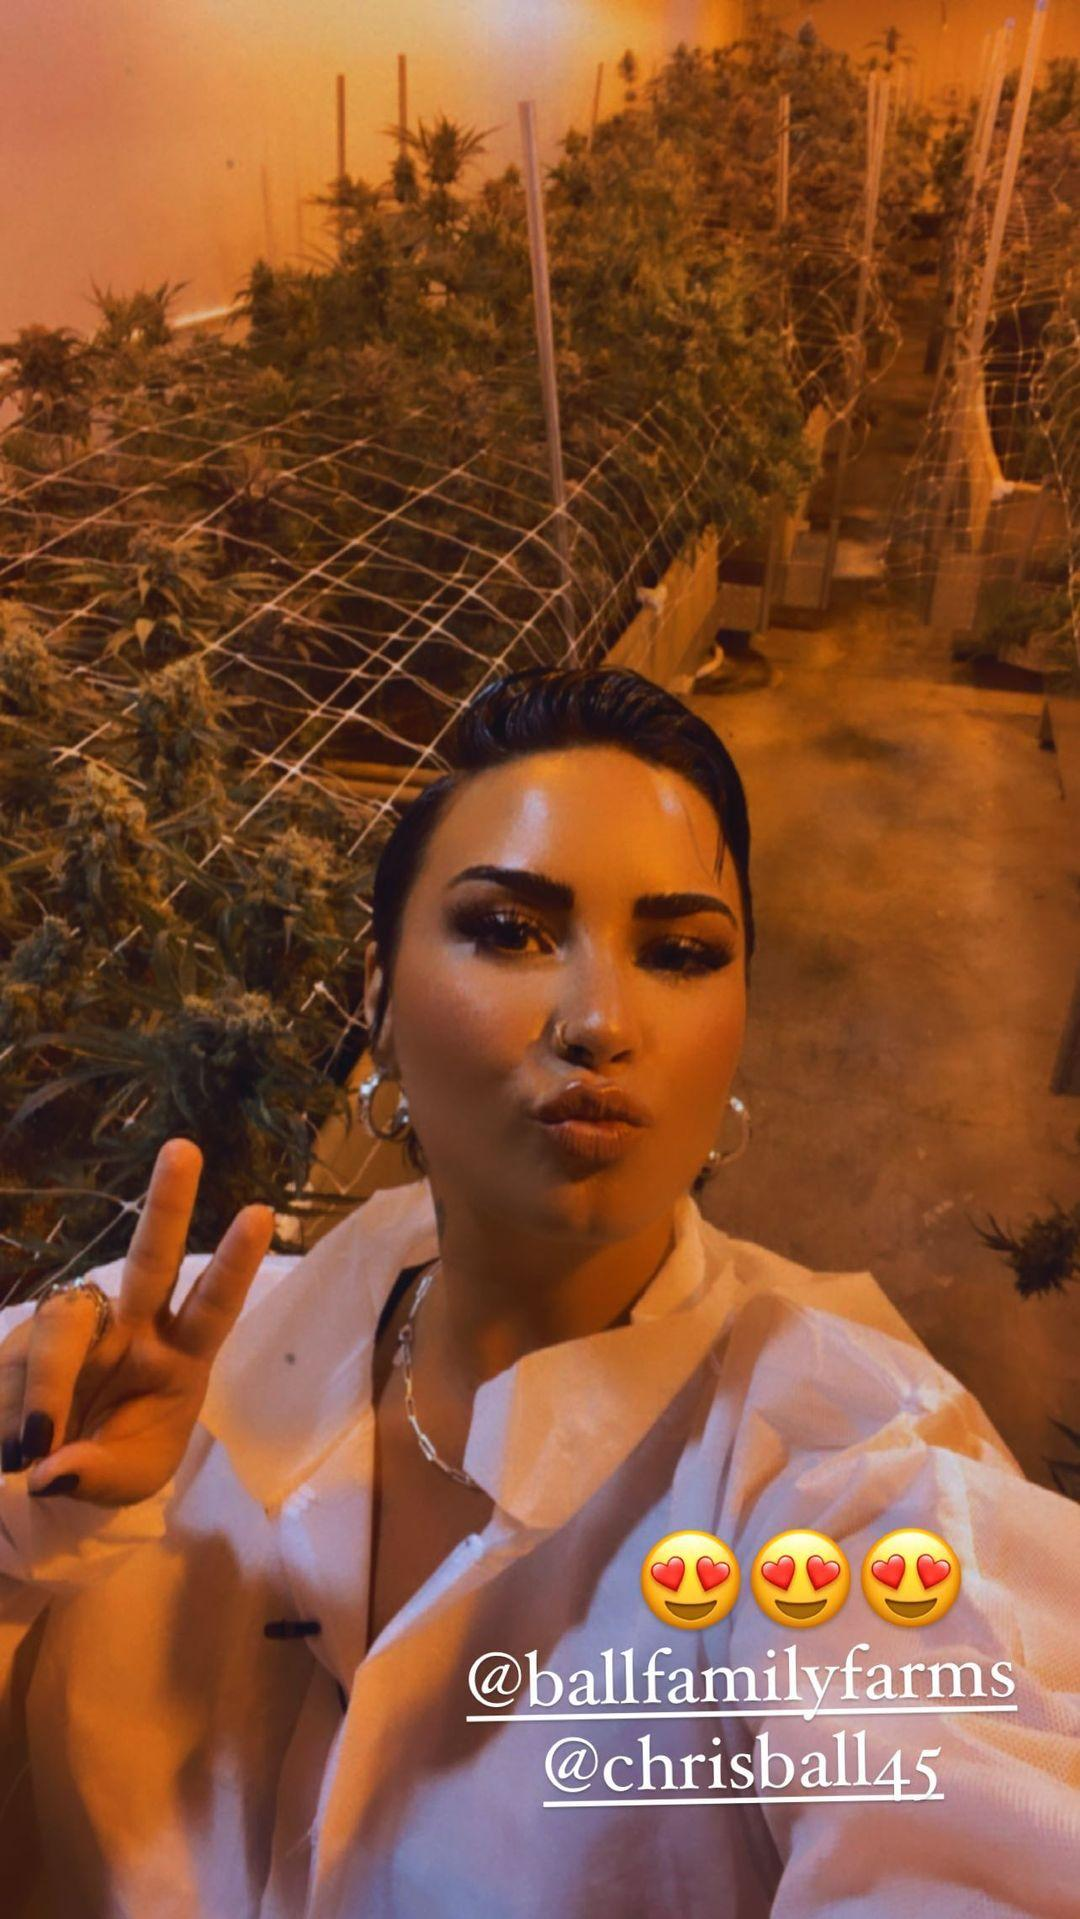 Demi Lovato Shares Video Smoking Weed, 'I'm California Sober!'